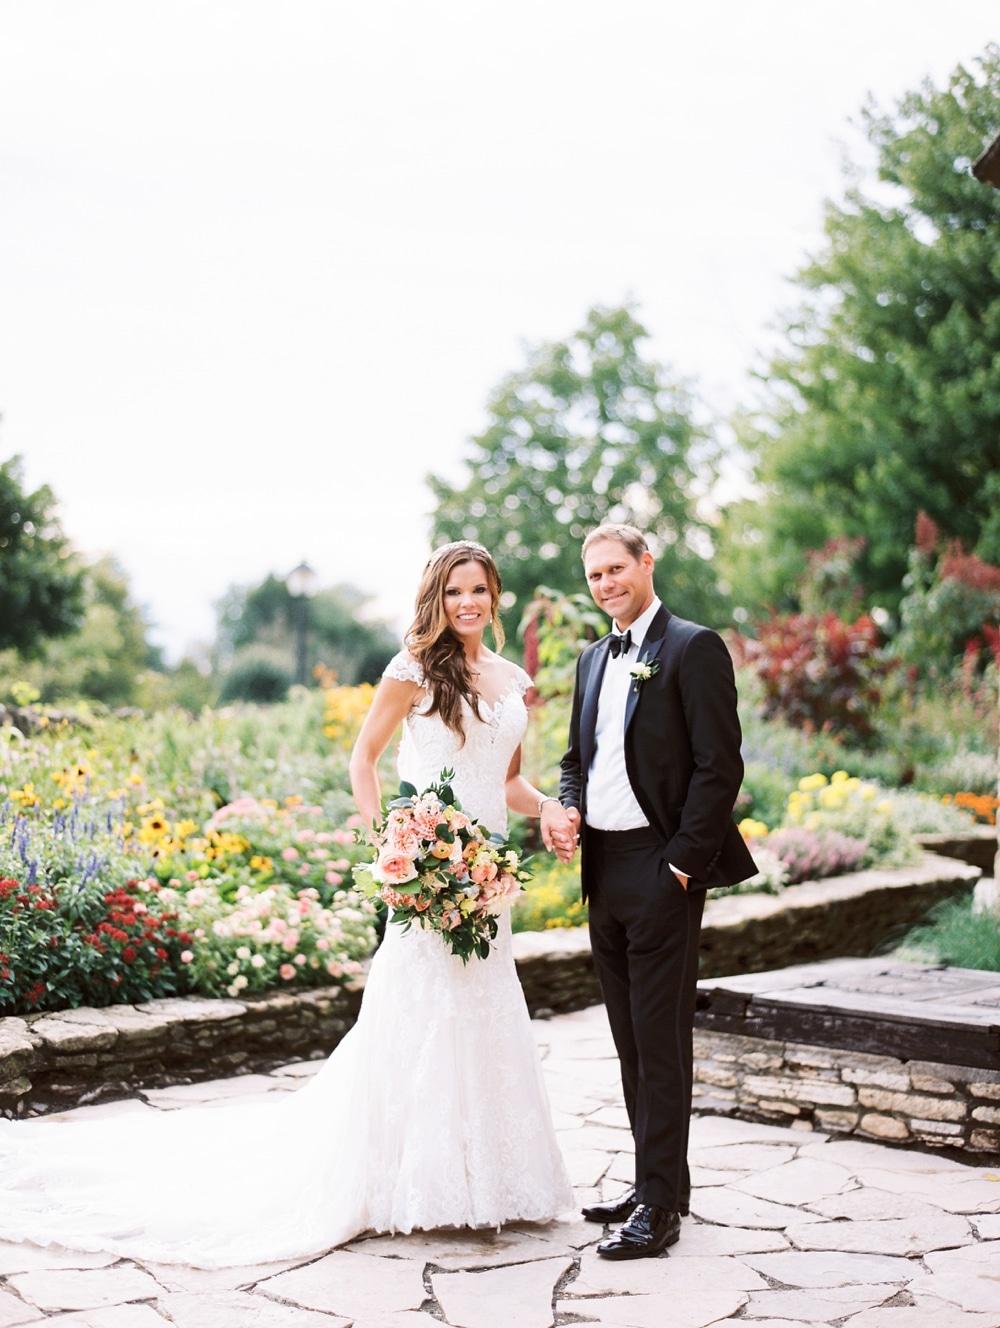 kristin-la-voie-photography-henry-ford-museum-detroit-wedding-photographer-72